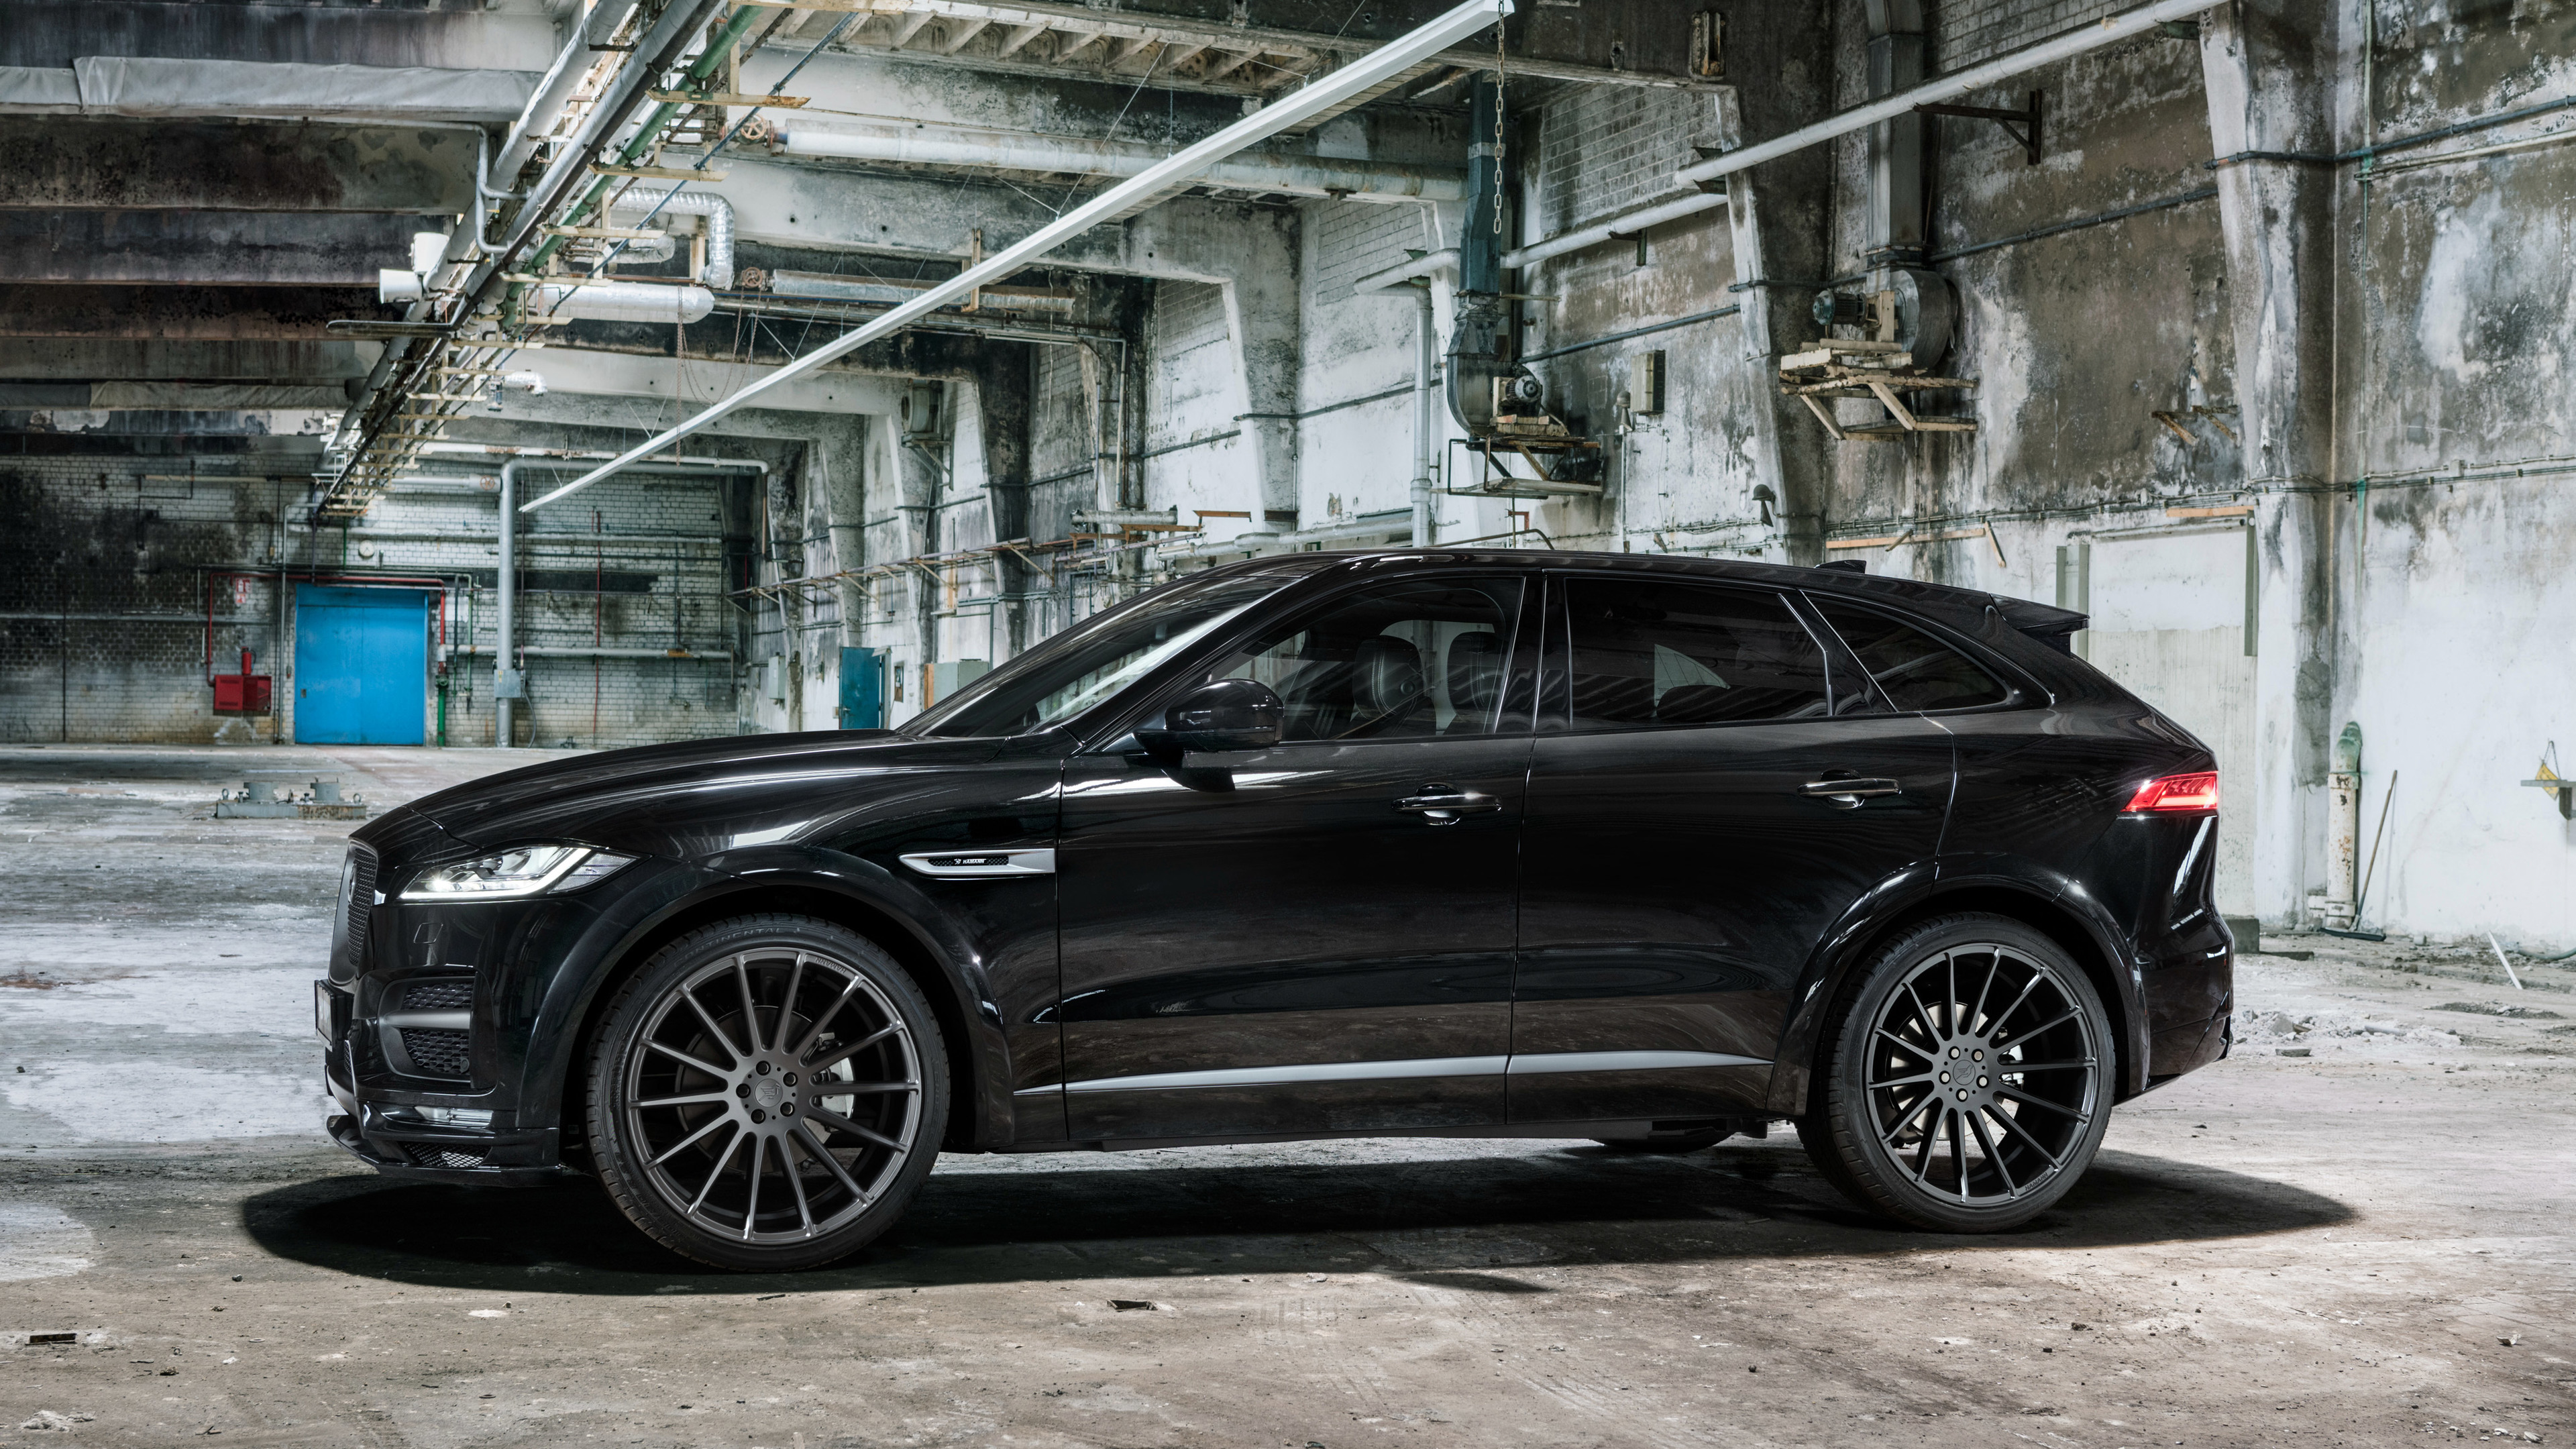 hamann jaguar f pace 1539105179 - Hamann Jaguar F Pace - jaguar wallpapers, hd-wallpapers, cars wallpapers, 4k-wallpapers, 2017 cars wallpapers